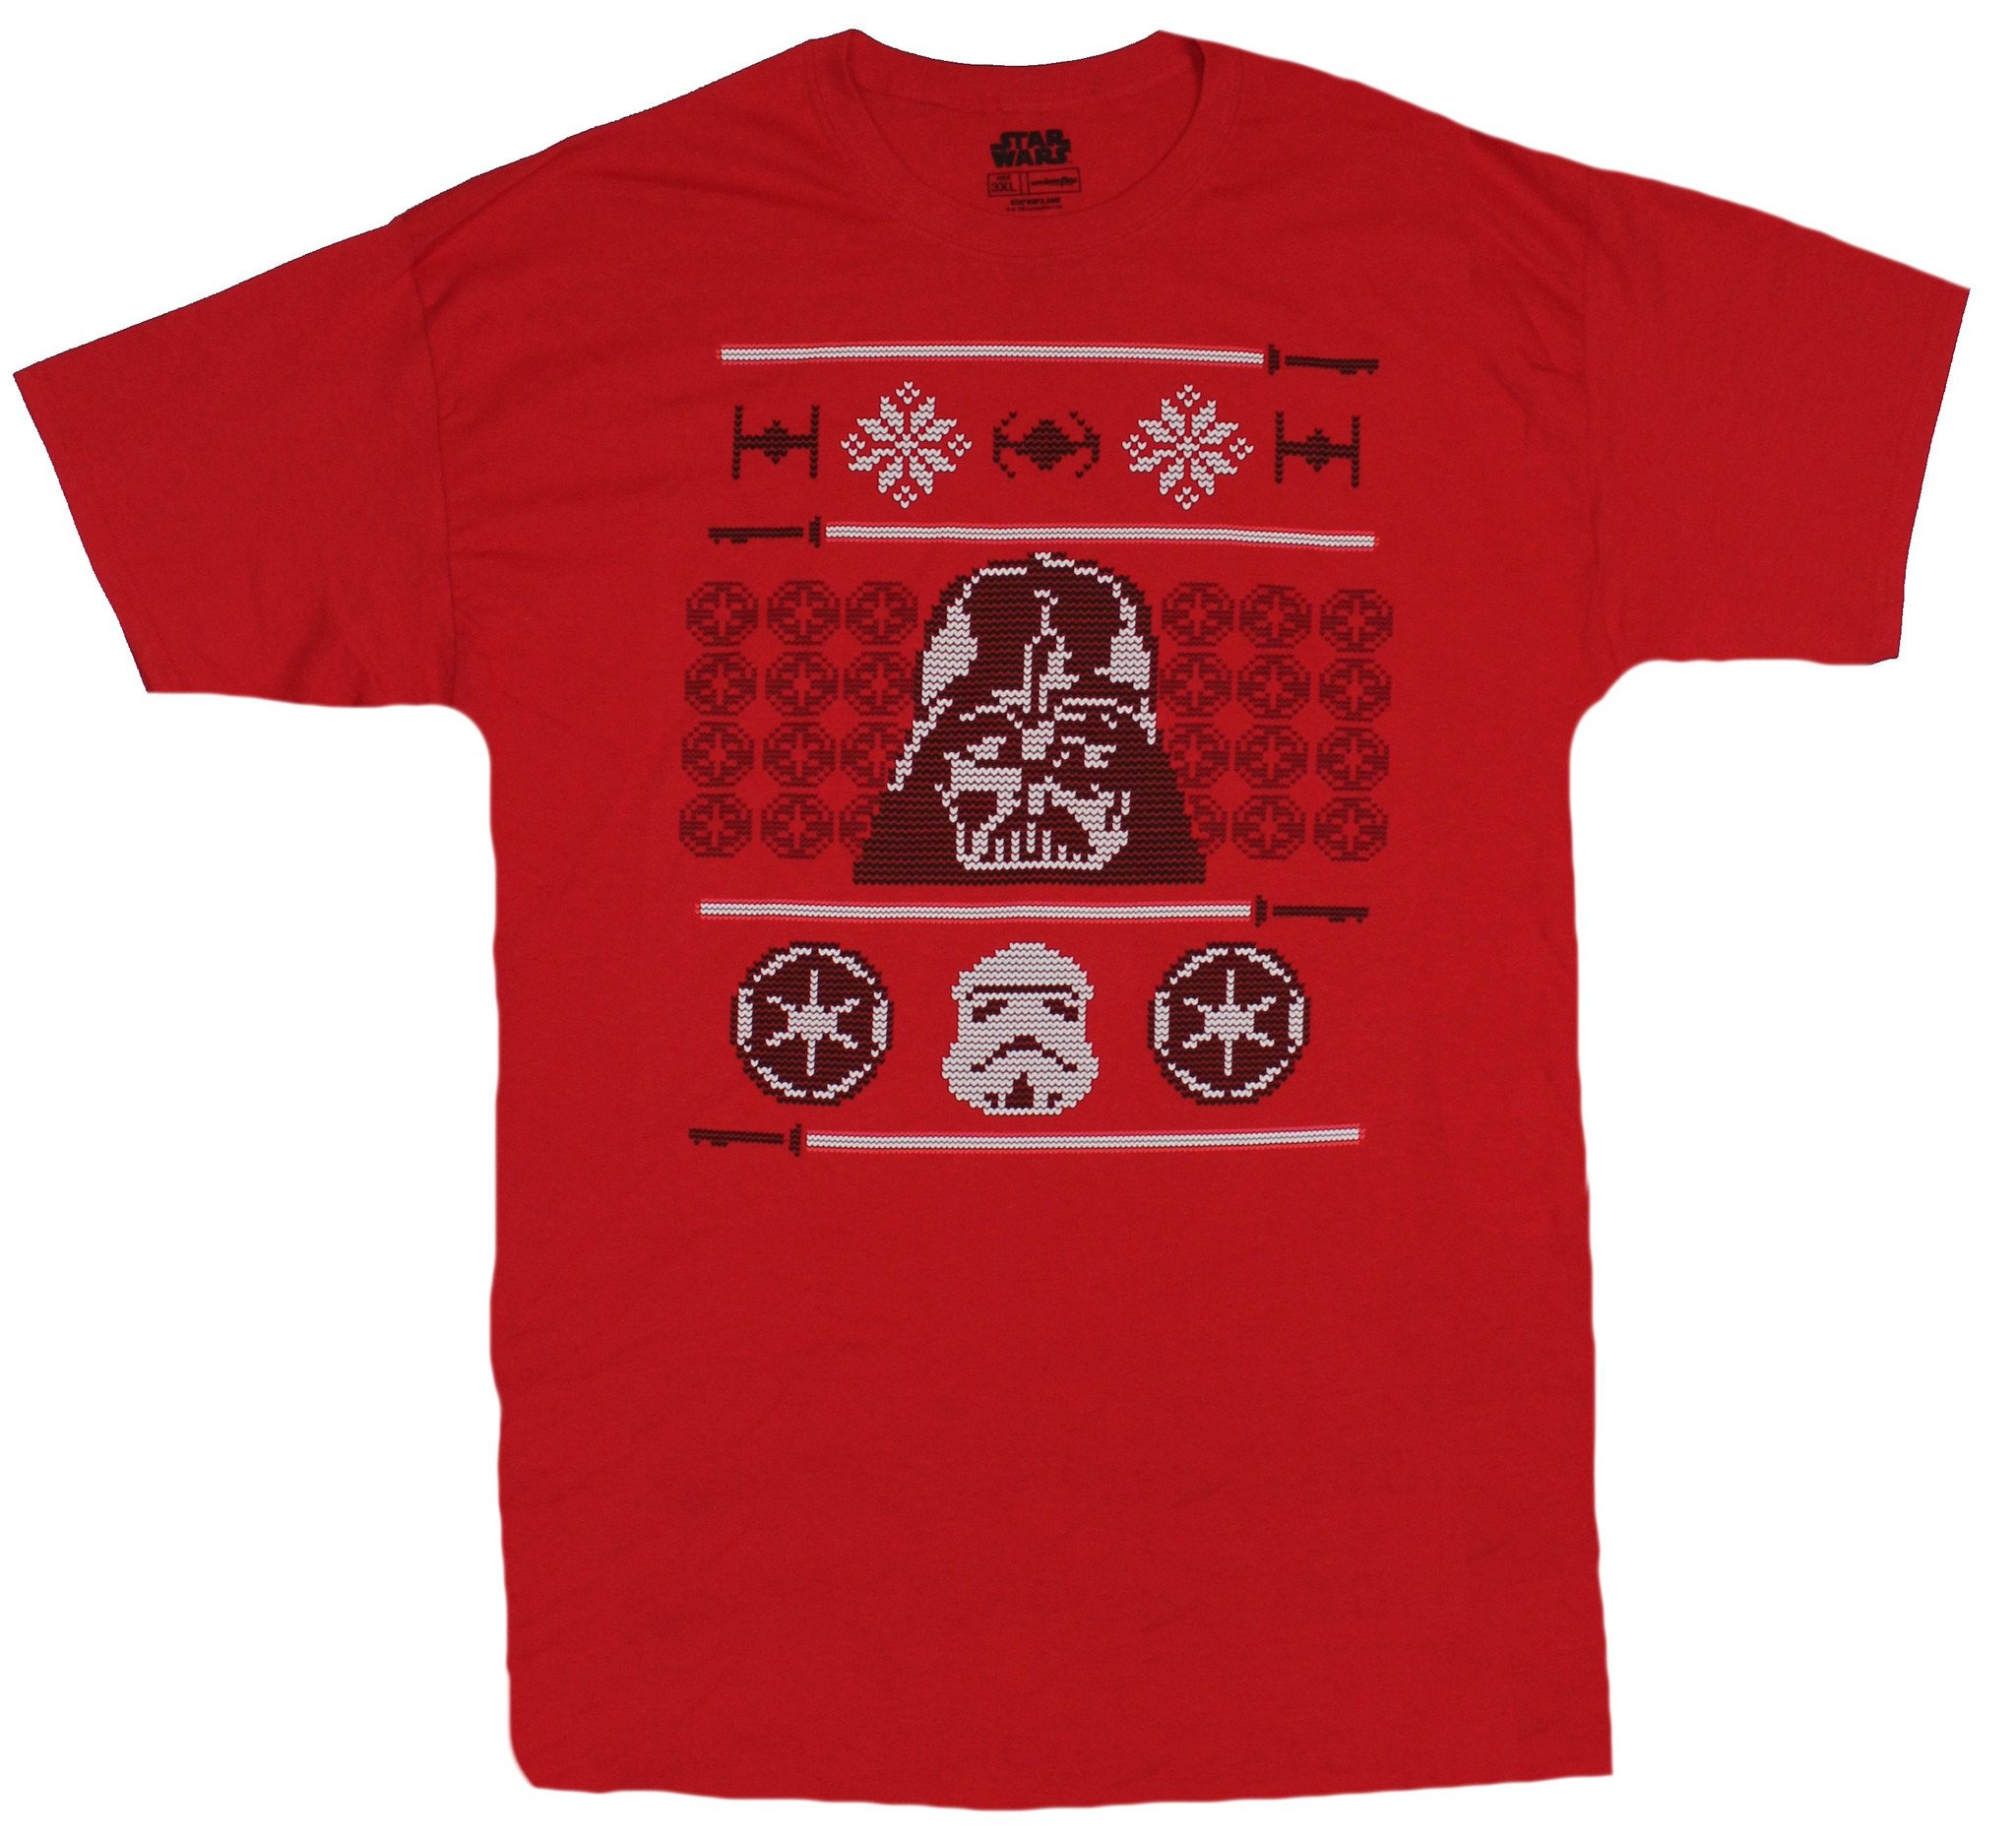 Star Wars Mens T-Shirt - Imperial Darth Vader Ugly Sweater Image